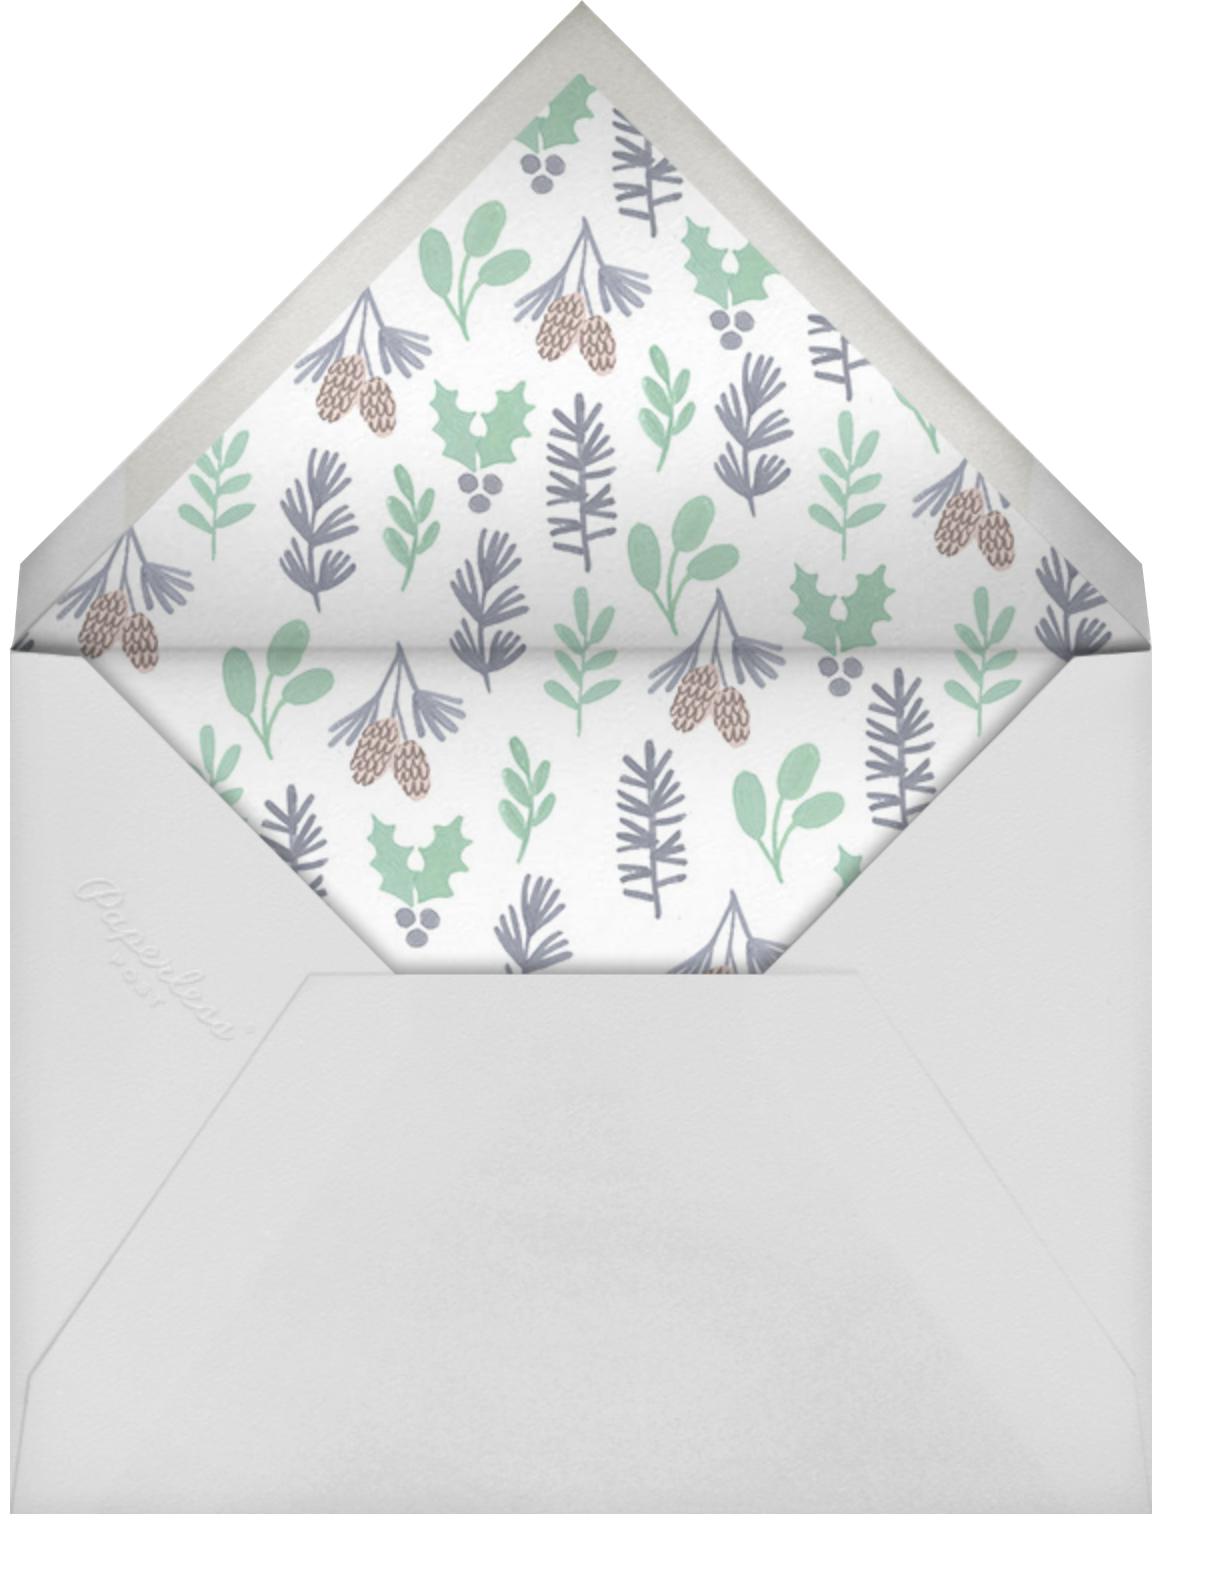 Winter Mobile - Paperless Post - Envelope